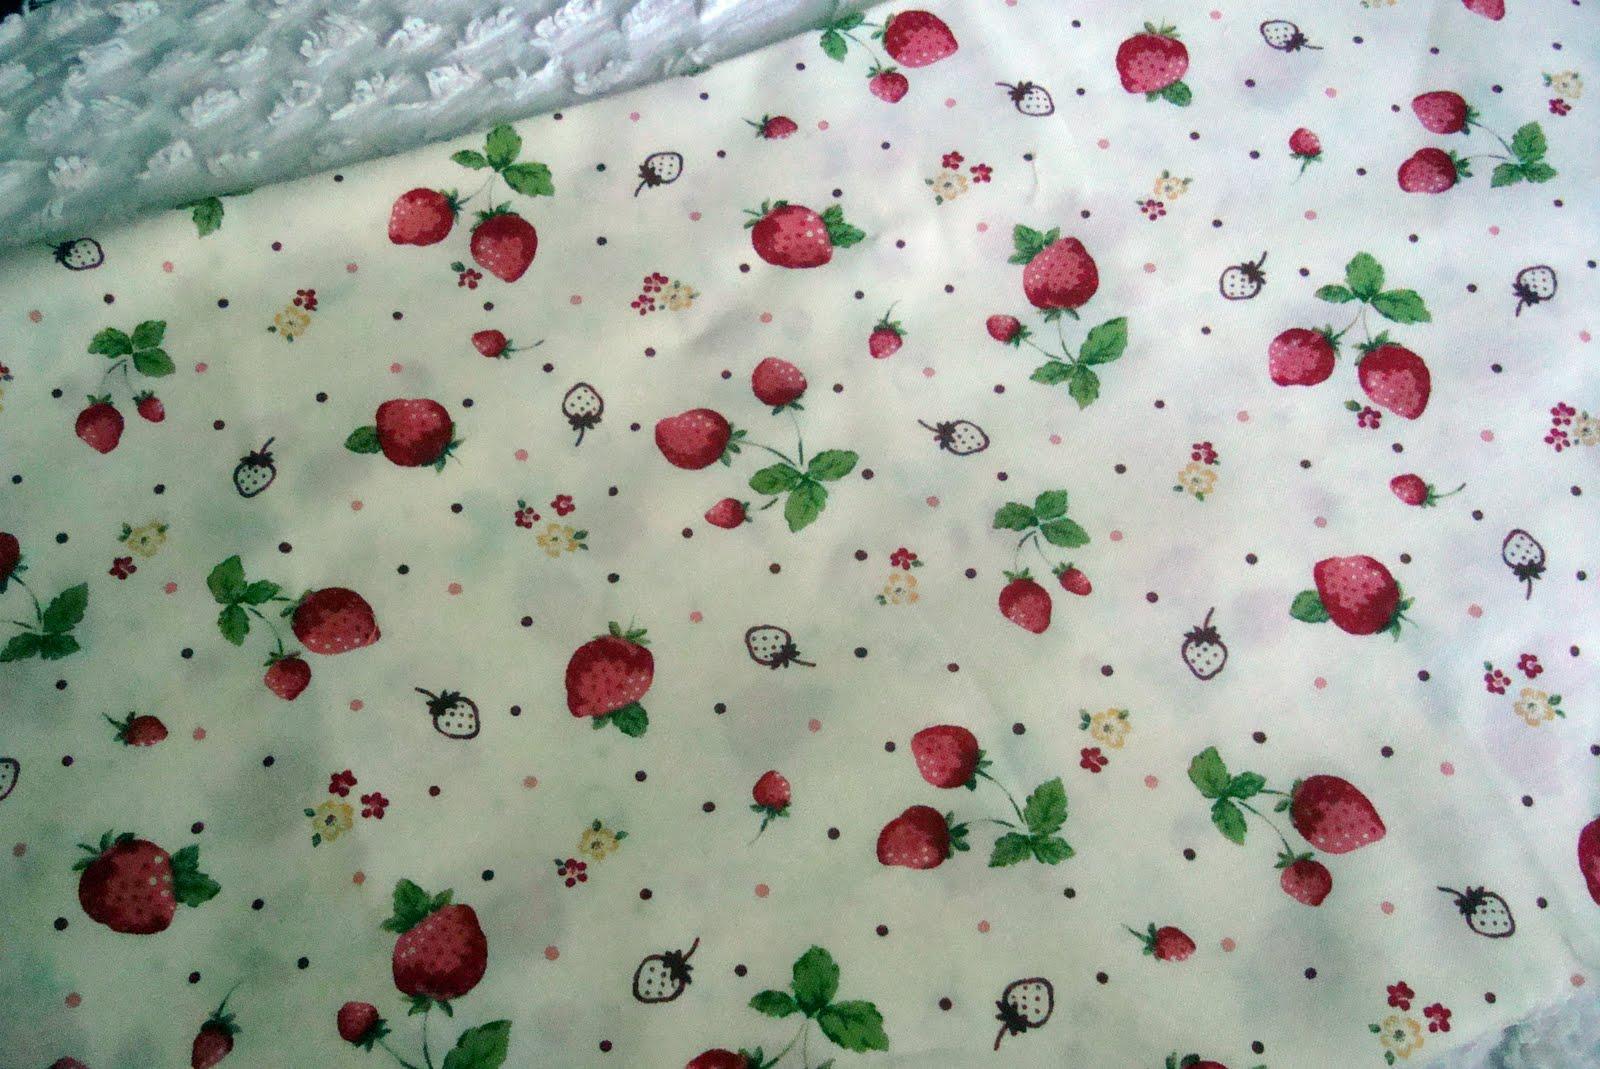 http://4.bp.blogspot.com/-bZQQ3SLJEQM/TjLMo-sYGrI/AAAAAAAALuE/oaVMckUBKUo/s1600/strawberriesverycotton1.jpg